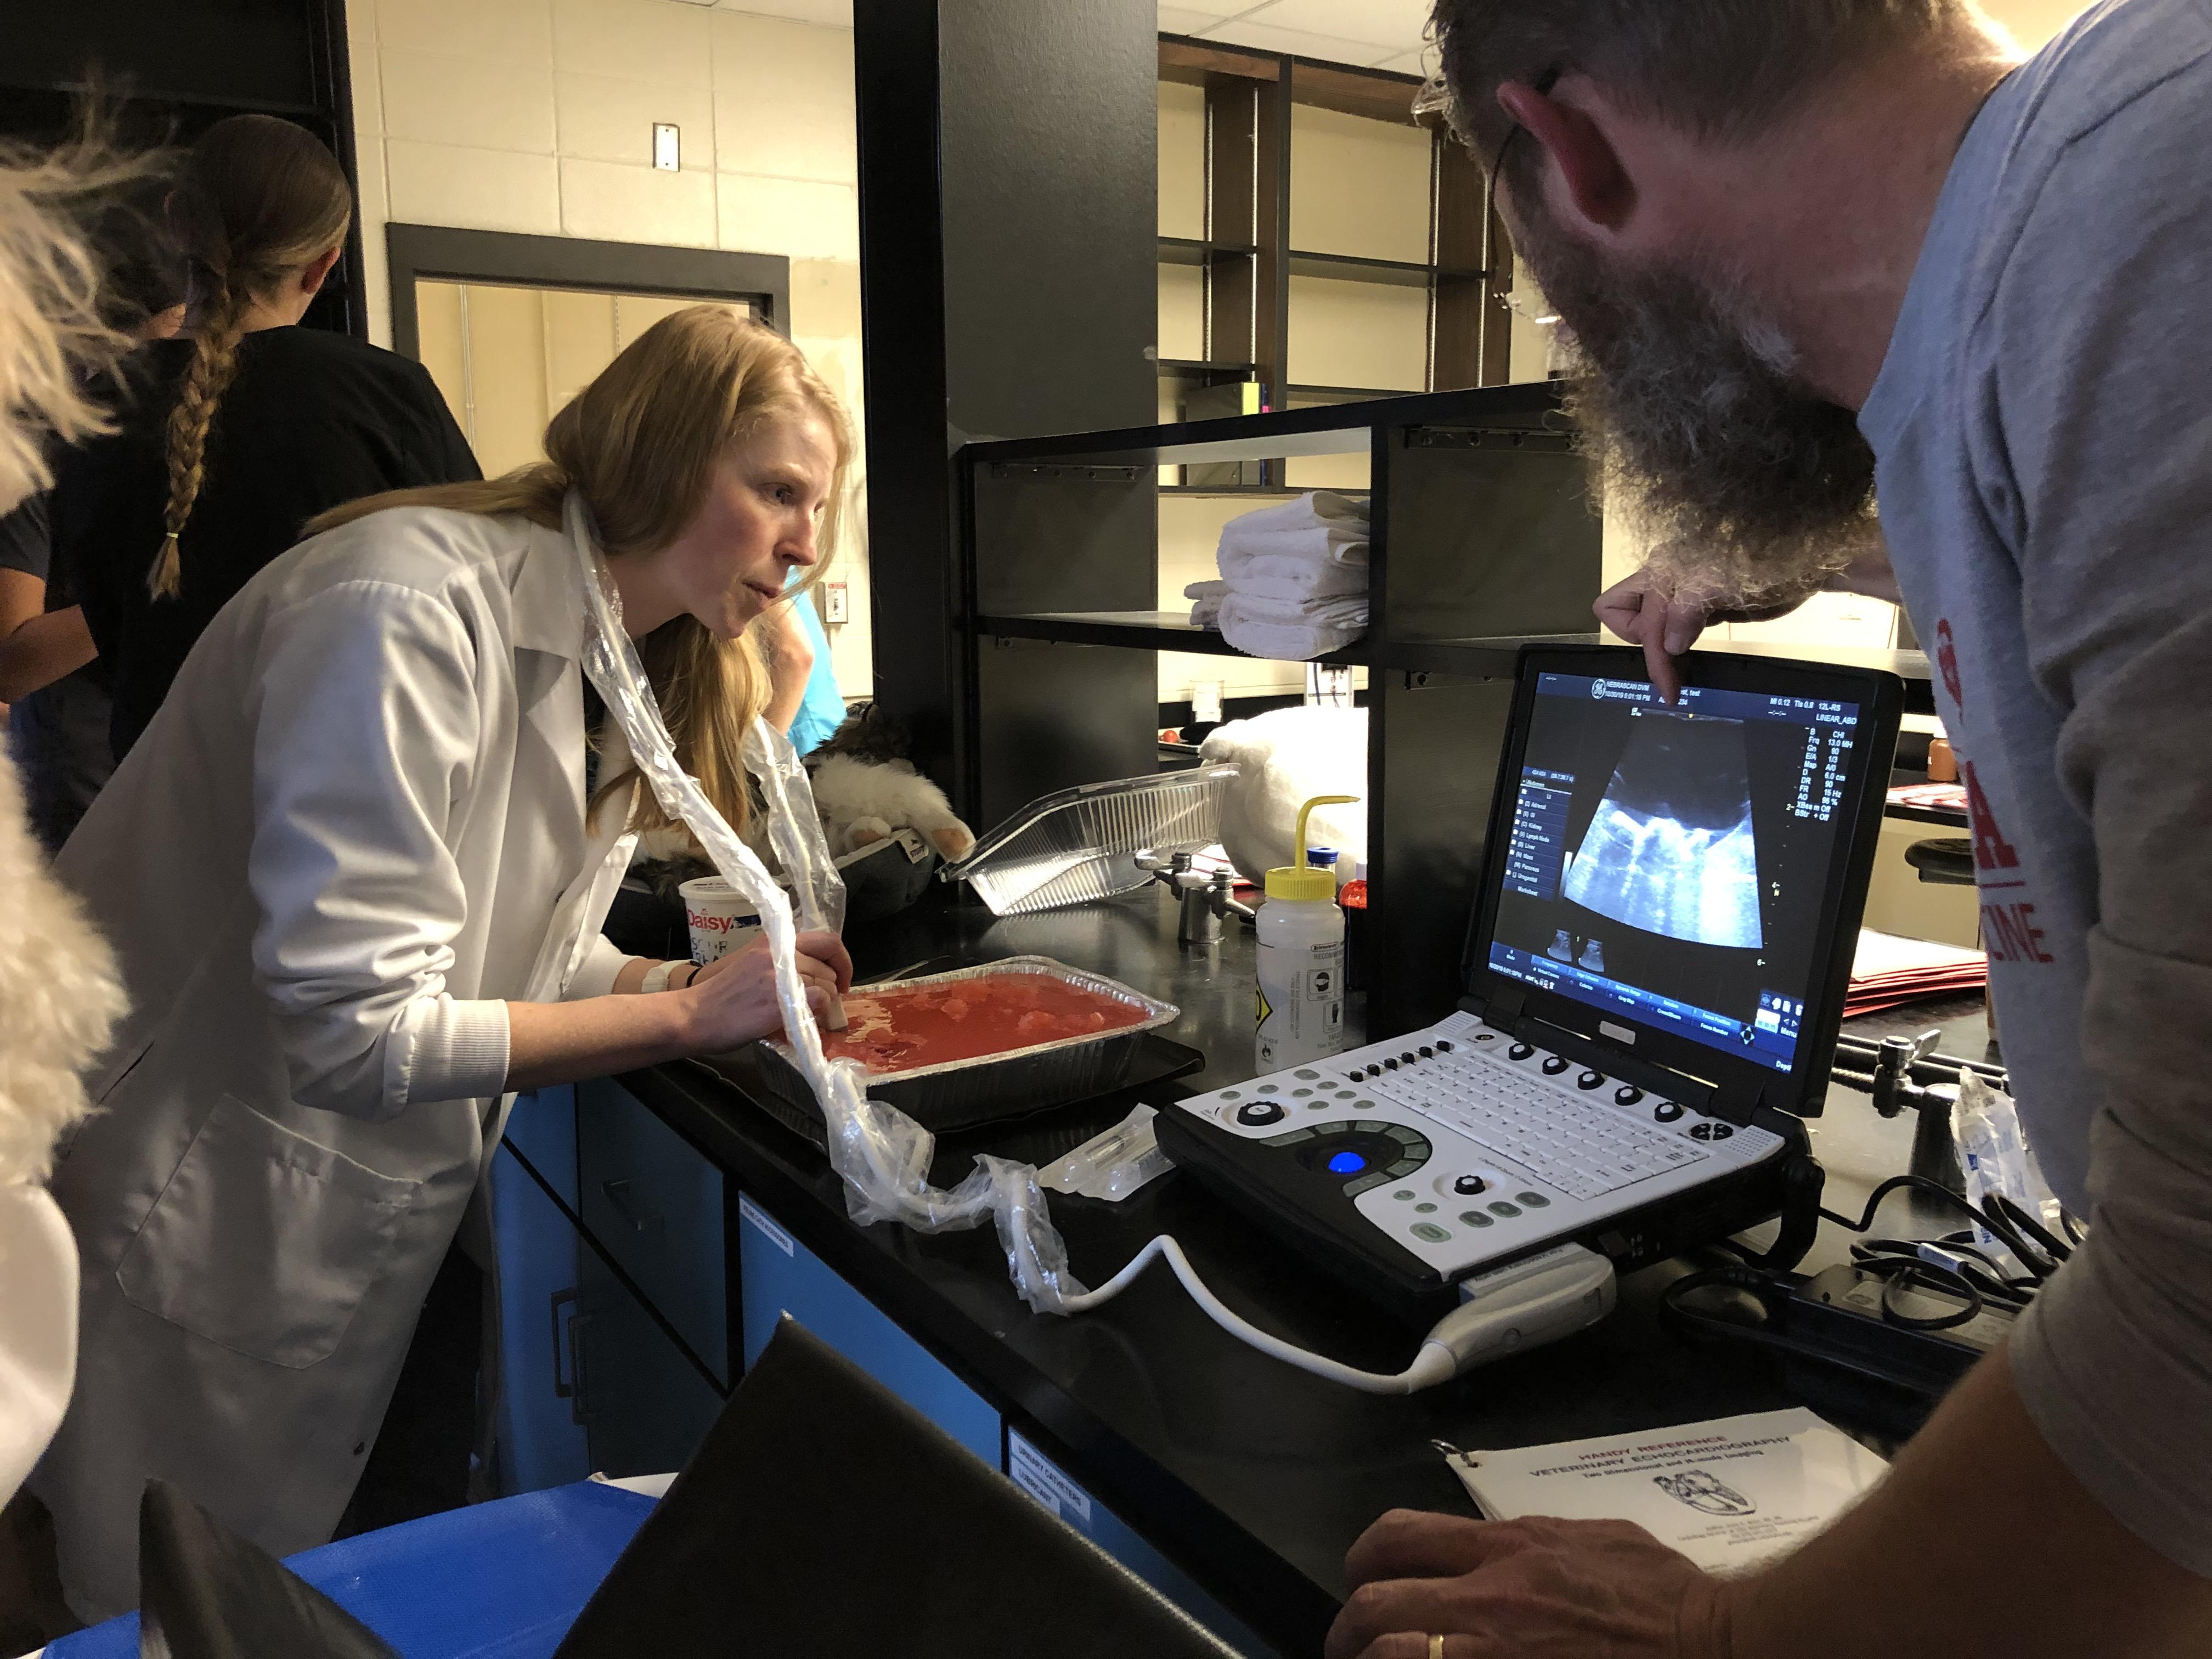 Fisheries and wildlife major Carolyn Hanish is now midway through Nebraska's Professional Program in Veterinary Medicine. Courtesy Reilly Grealish